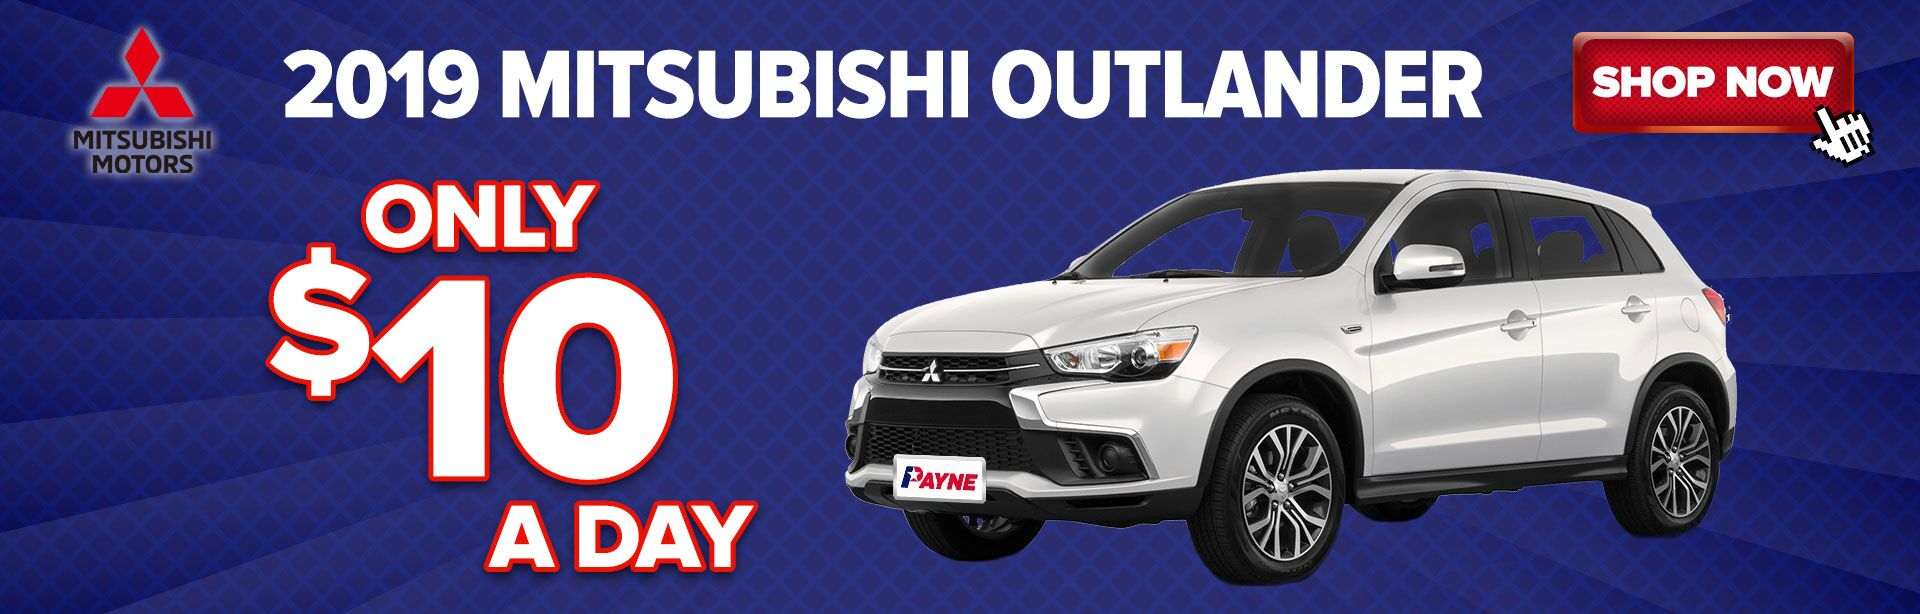 Volkswagen Mitsubishi Dealership Mission TX Used Cars Payne